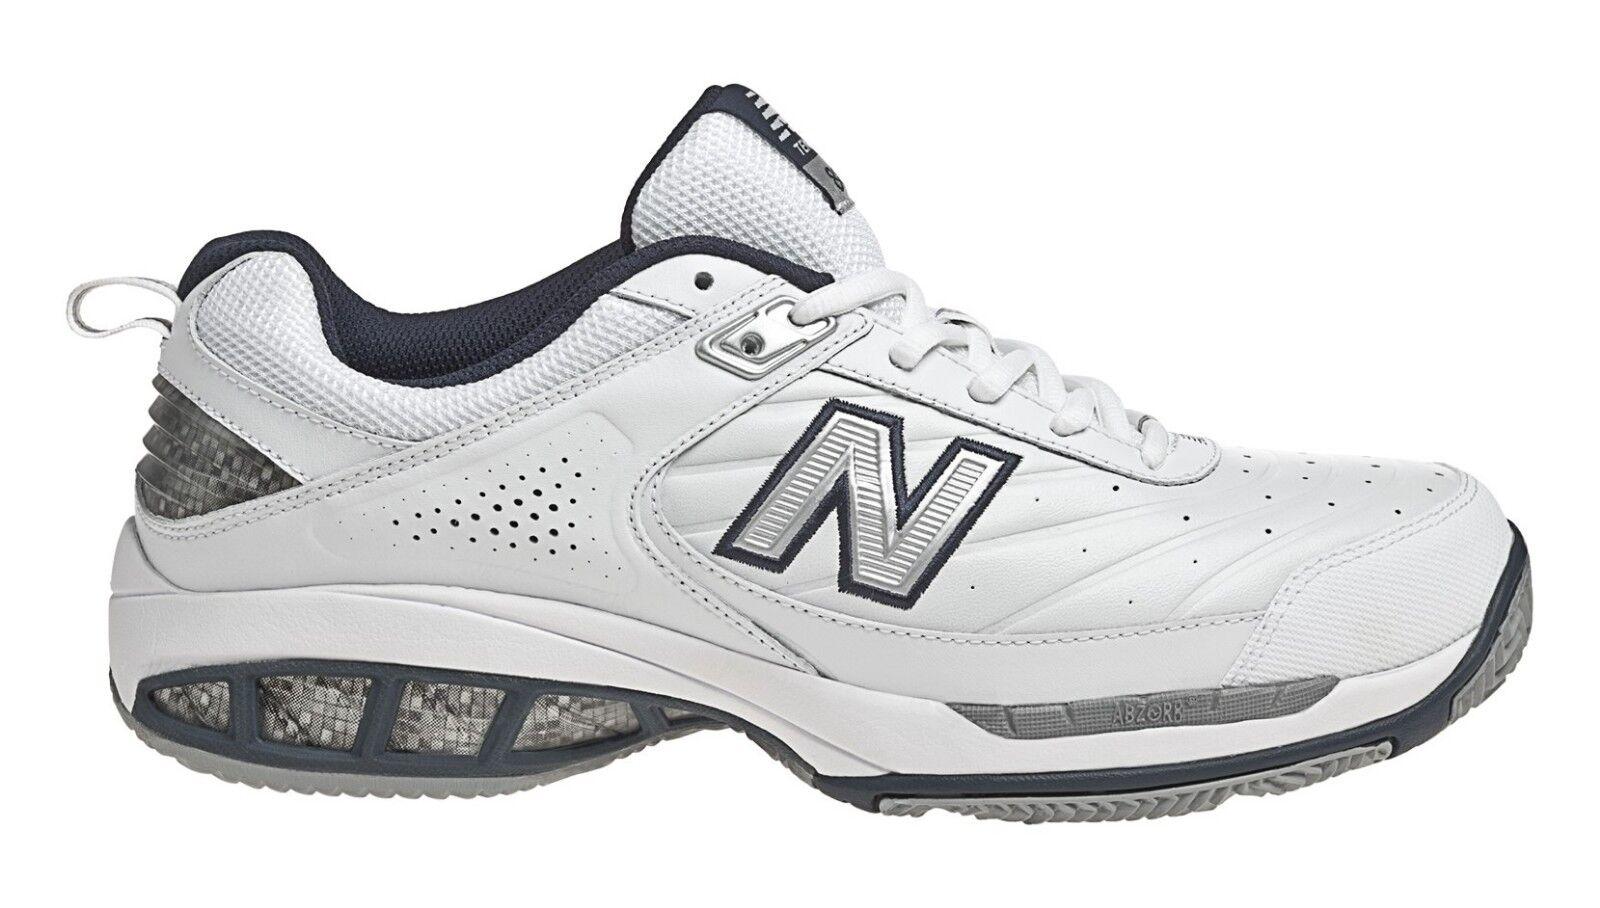 New Balance MC806W Men's Court 806 White Navy bluee Leather Core Tennis shoes